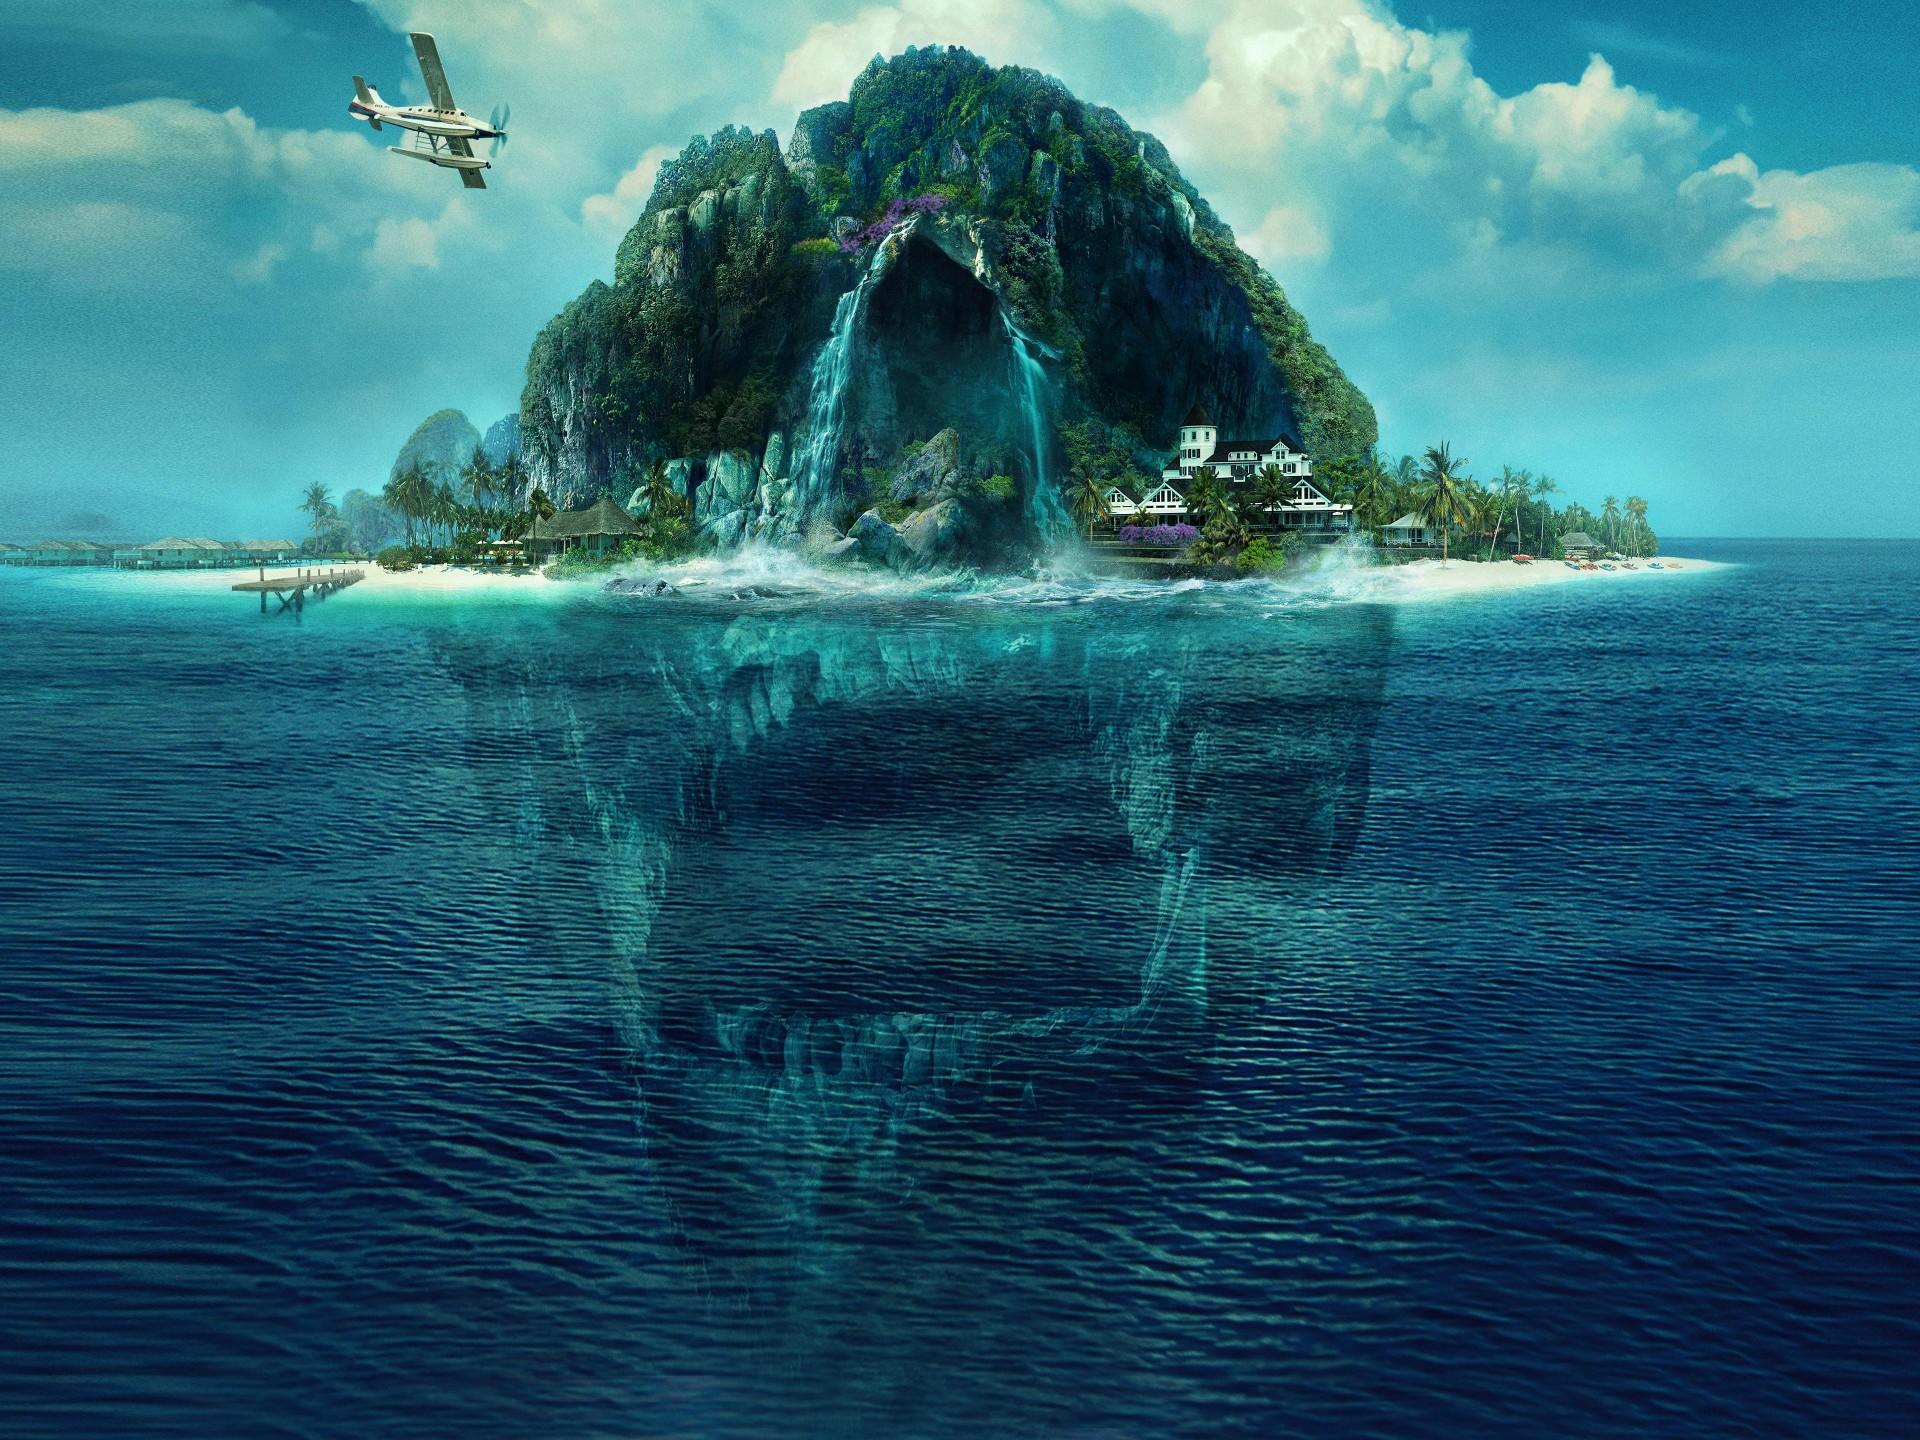 Fantasy Island 2020 4K 5K HD desktop wallpaper Widescreen High 1920x1440